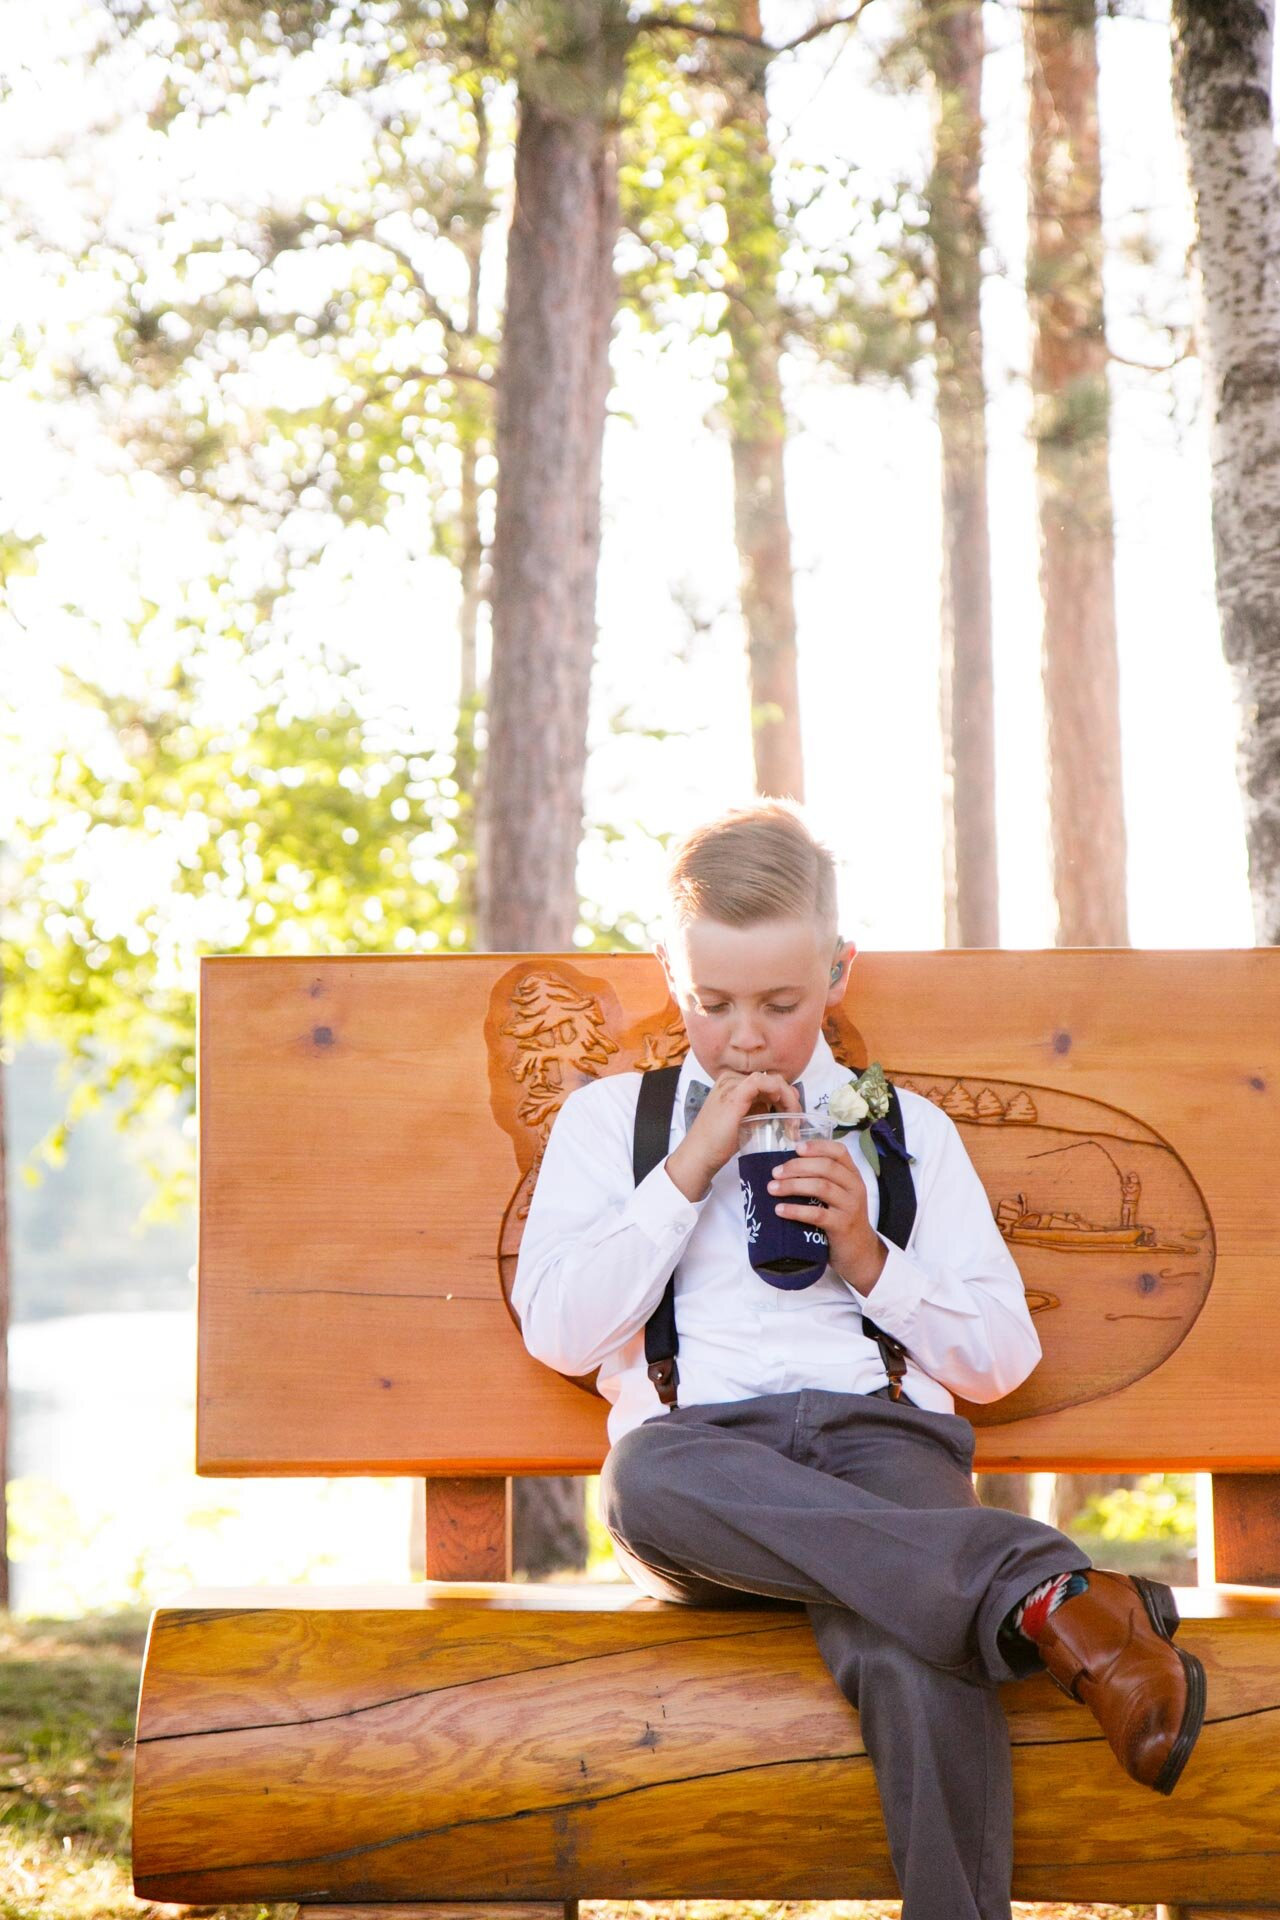 adam-shea-photography-fall-autumn-lighting-engagement-wedding-photos-adam-shea-photography-green-bay-appleton-neenah-photographer-03.jpg